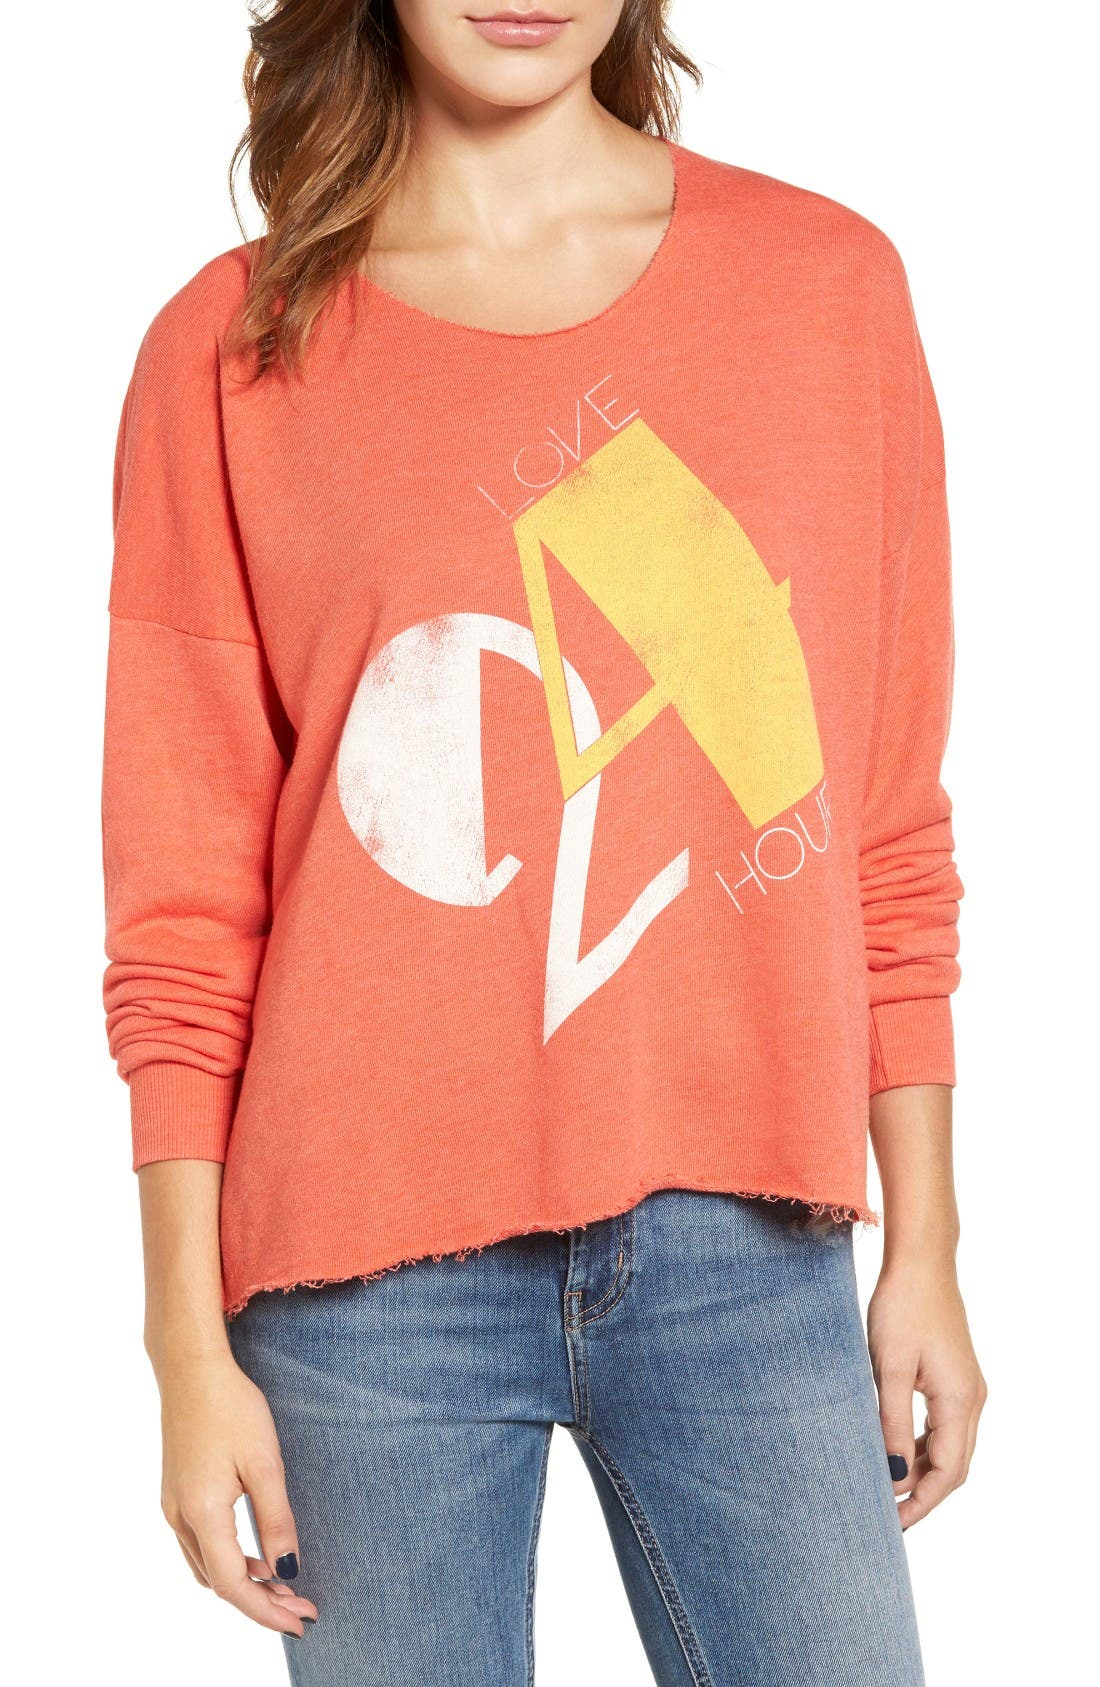 Main Image - Wildfox Love 24/7 Sweatshirt